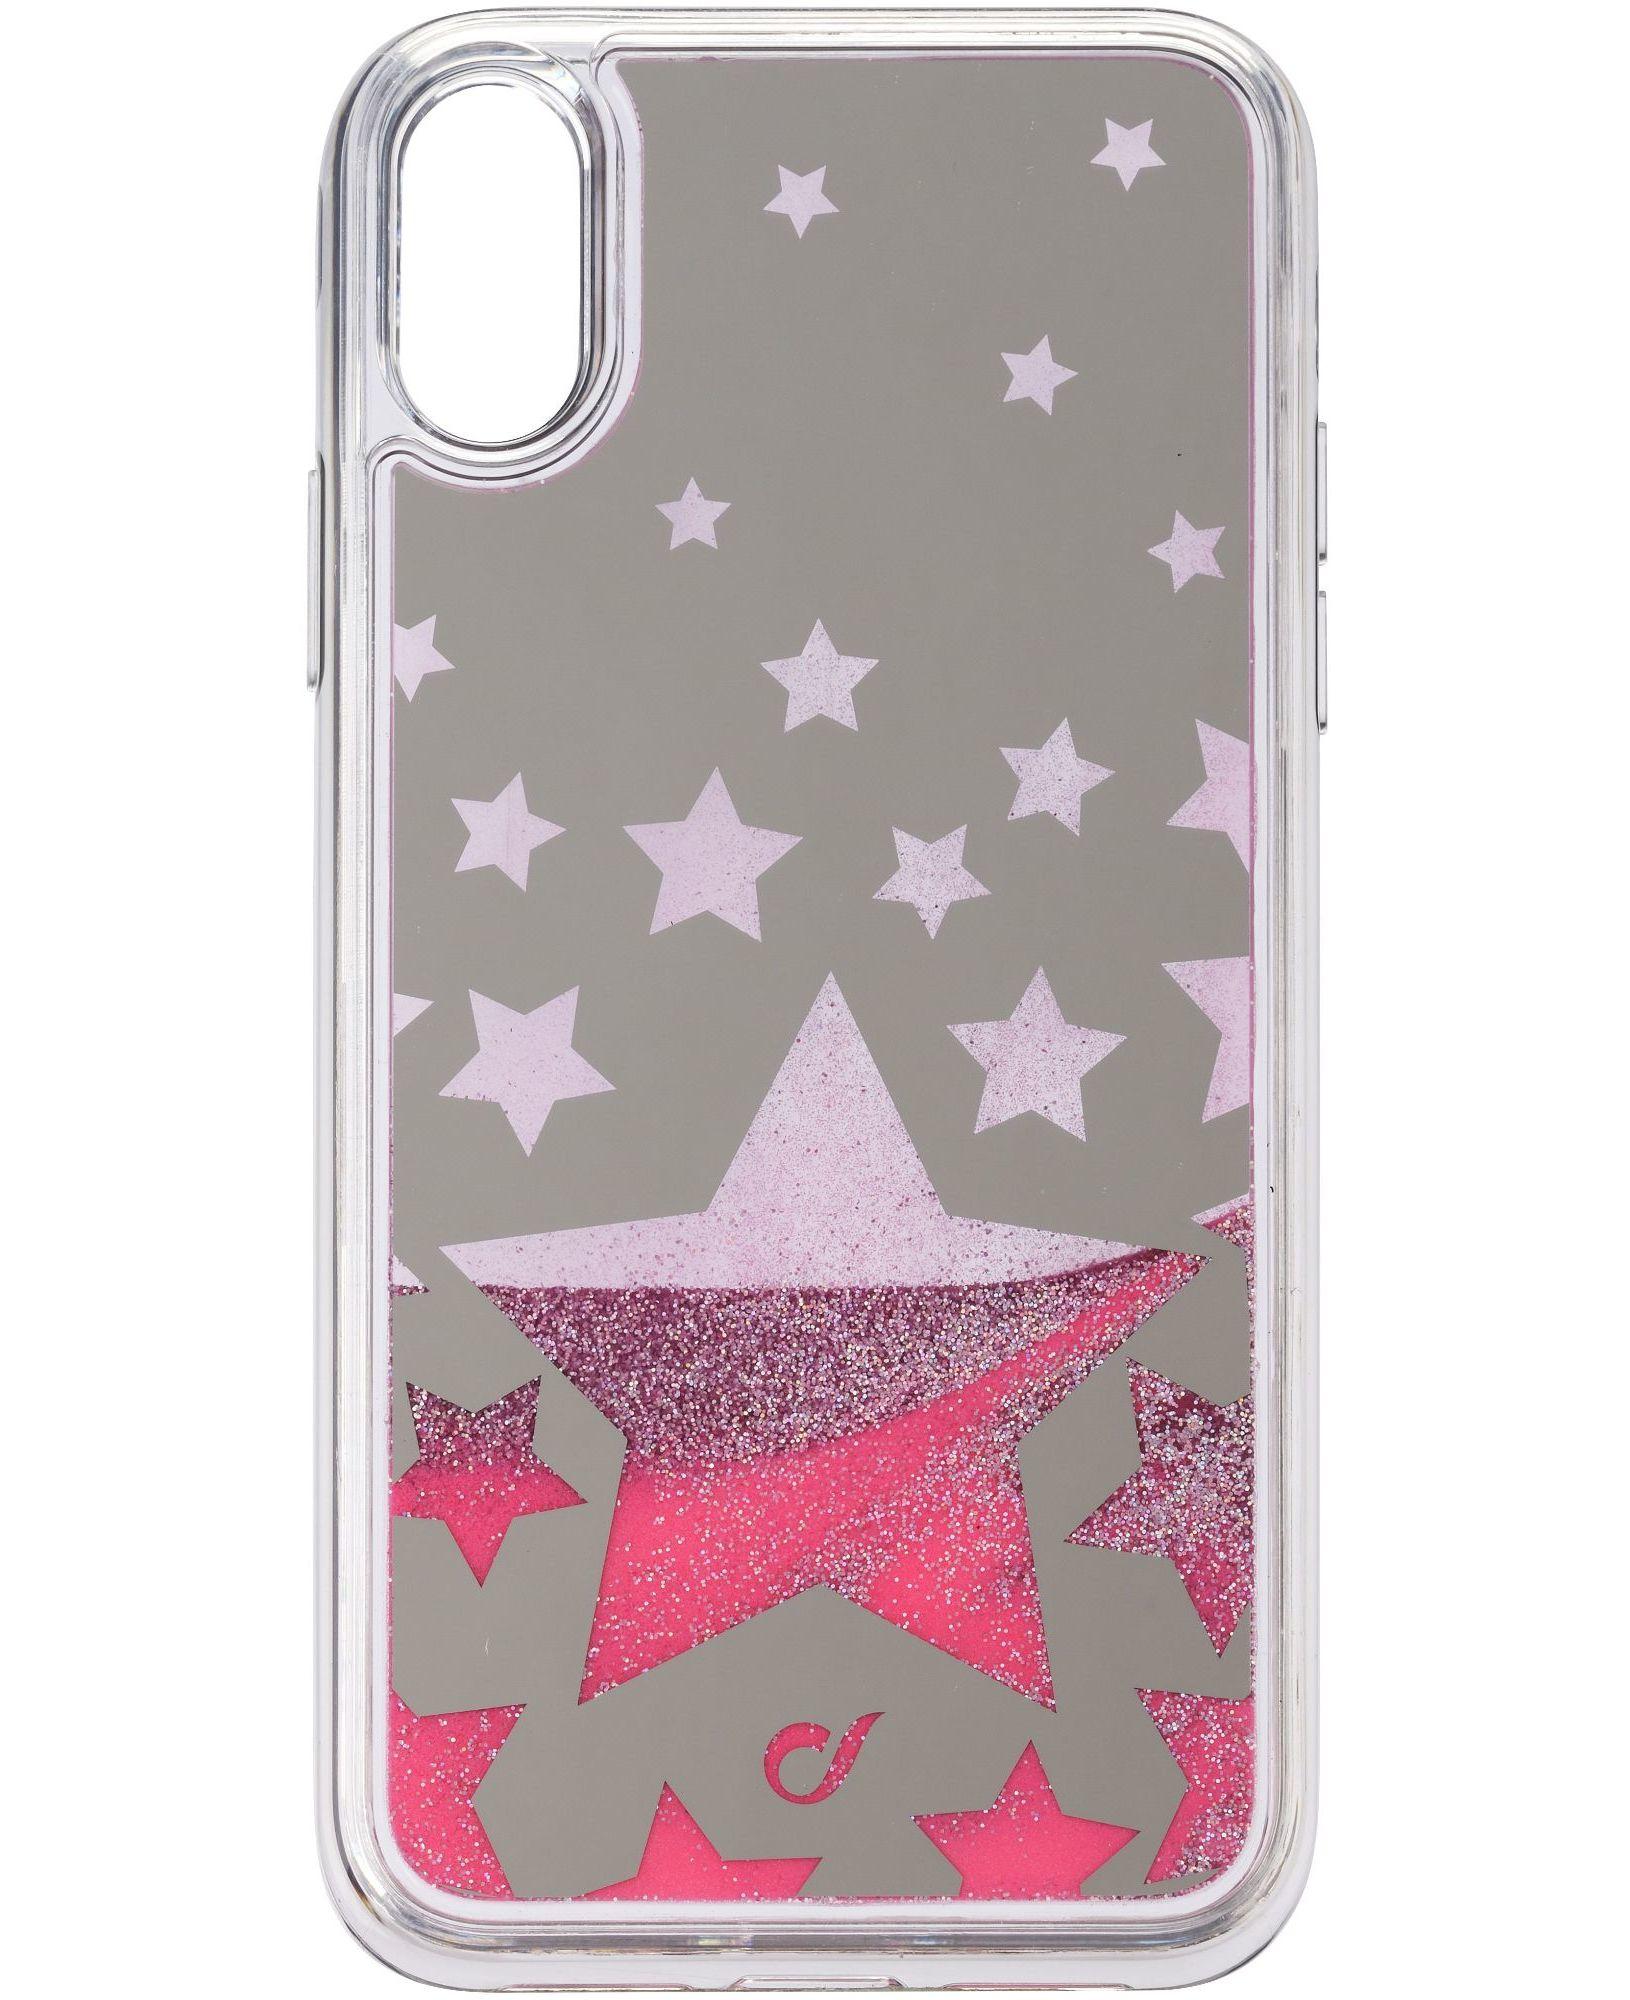 Cellular Line Stardust - iPhone XR Custodia rigida con bordi in gomma - Starduststariph961